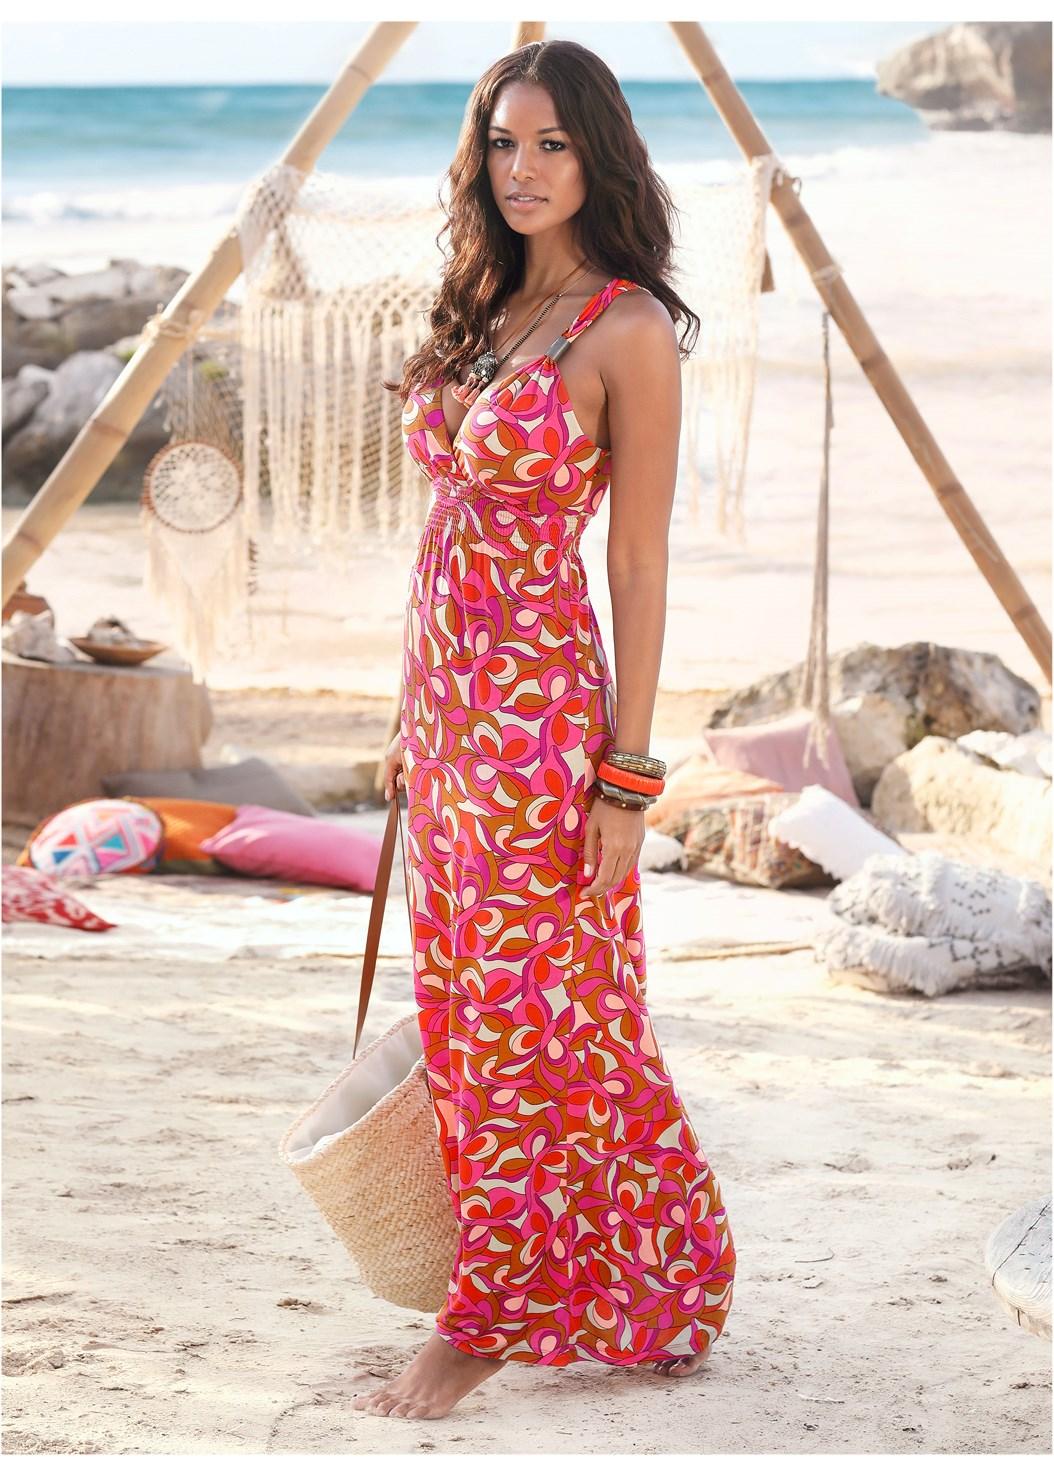 Geometric Print Maxi Dress,Woven Handbag